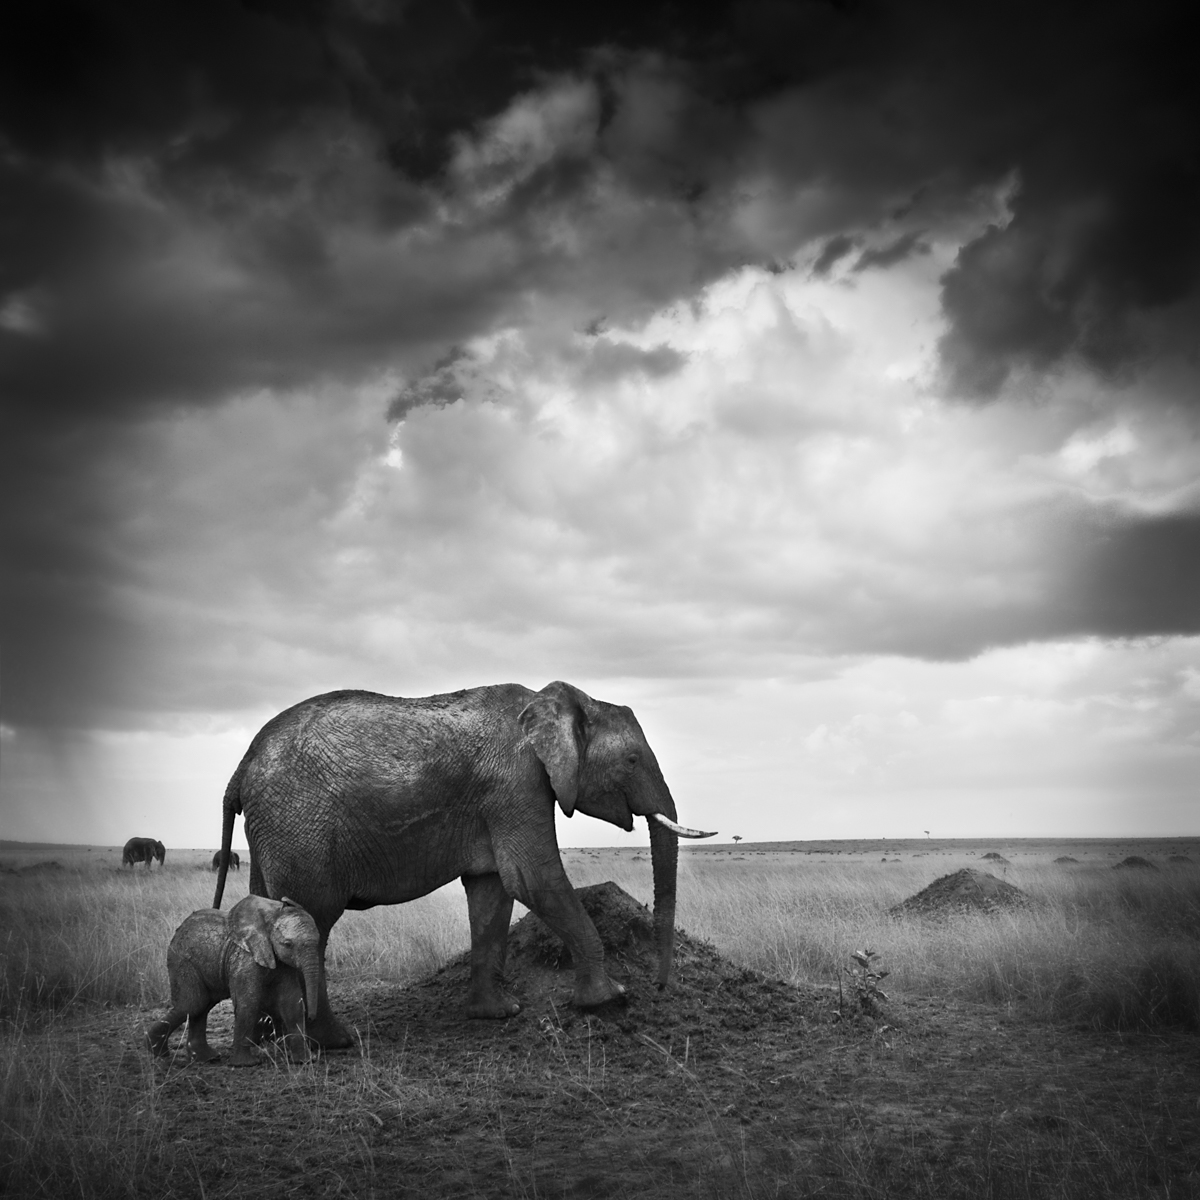 Elephants On Termite Mound - Maasai Mara, Kenya